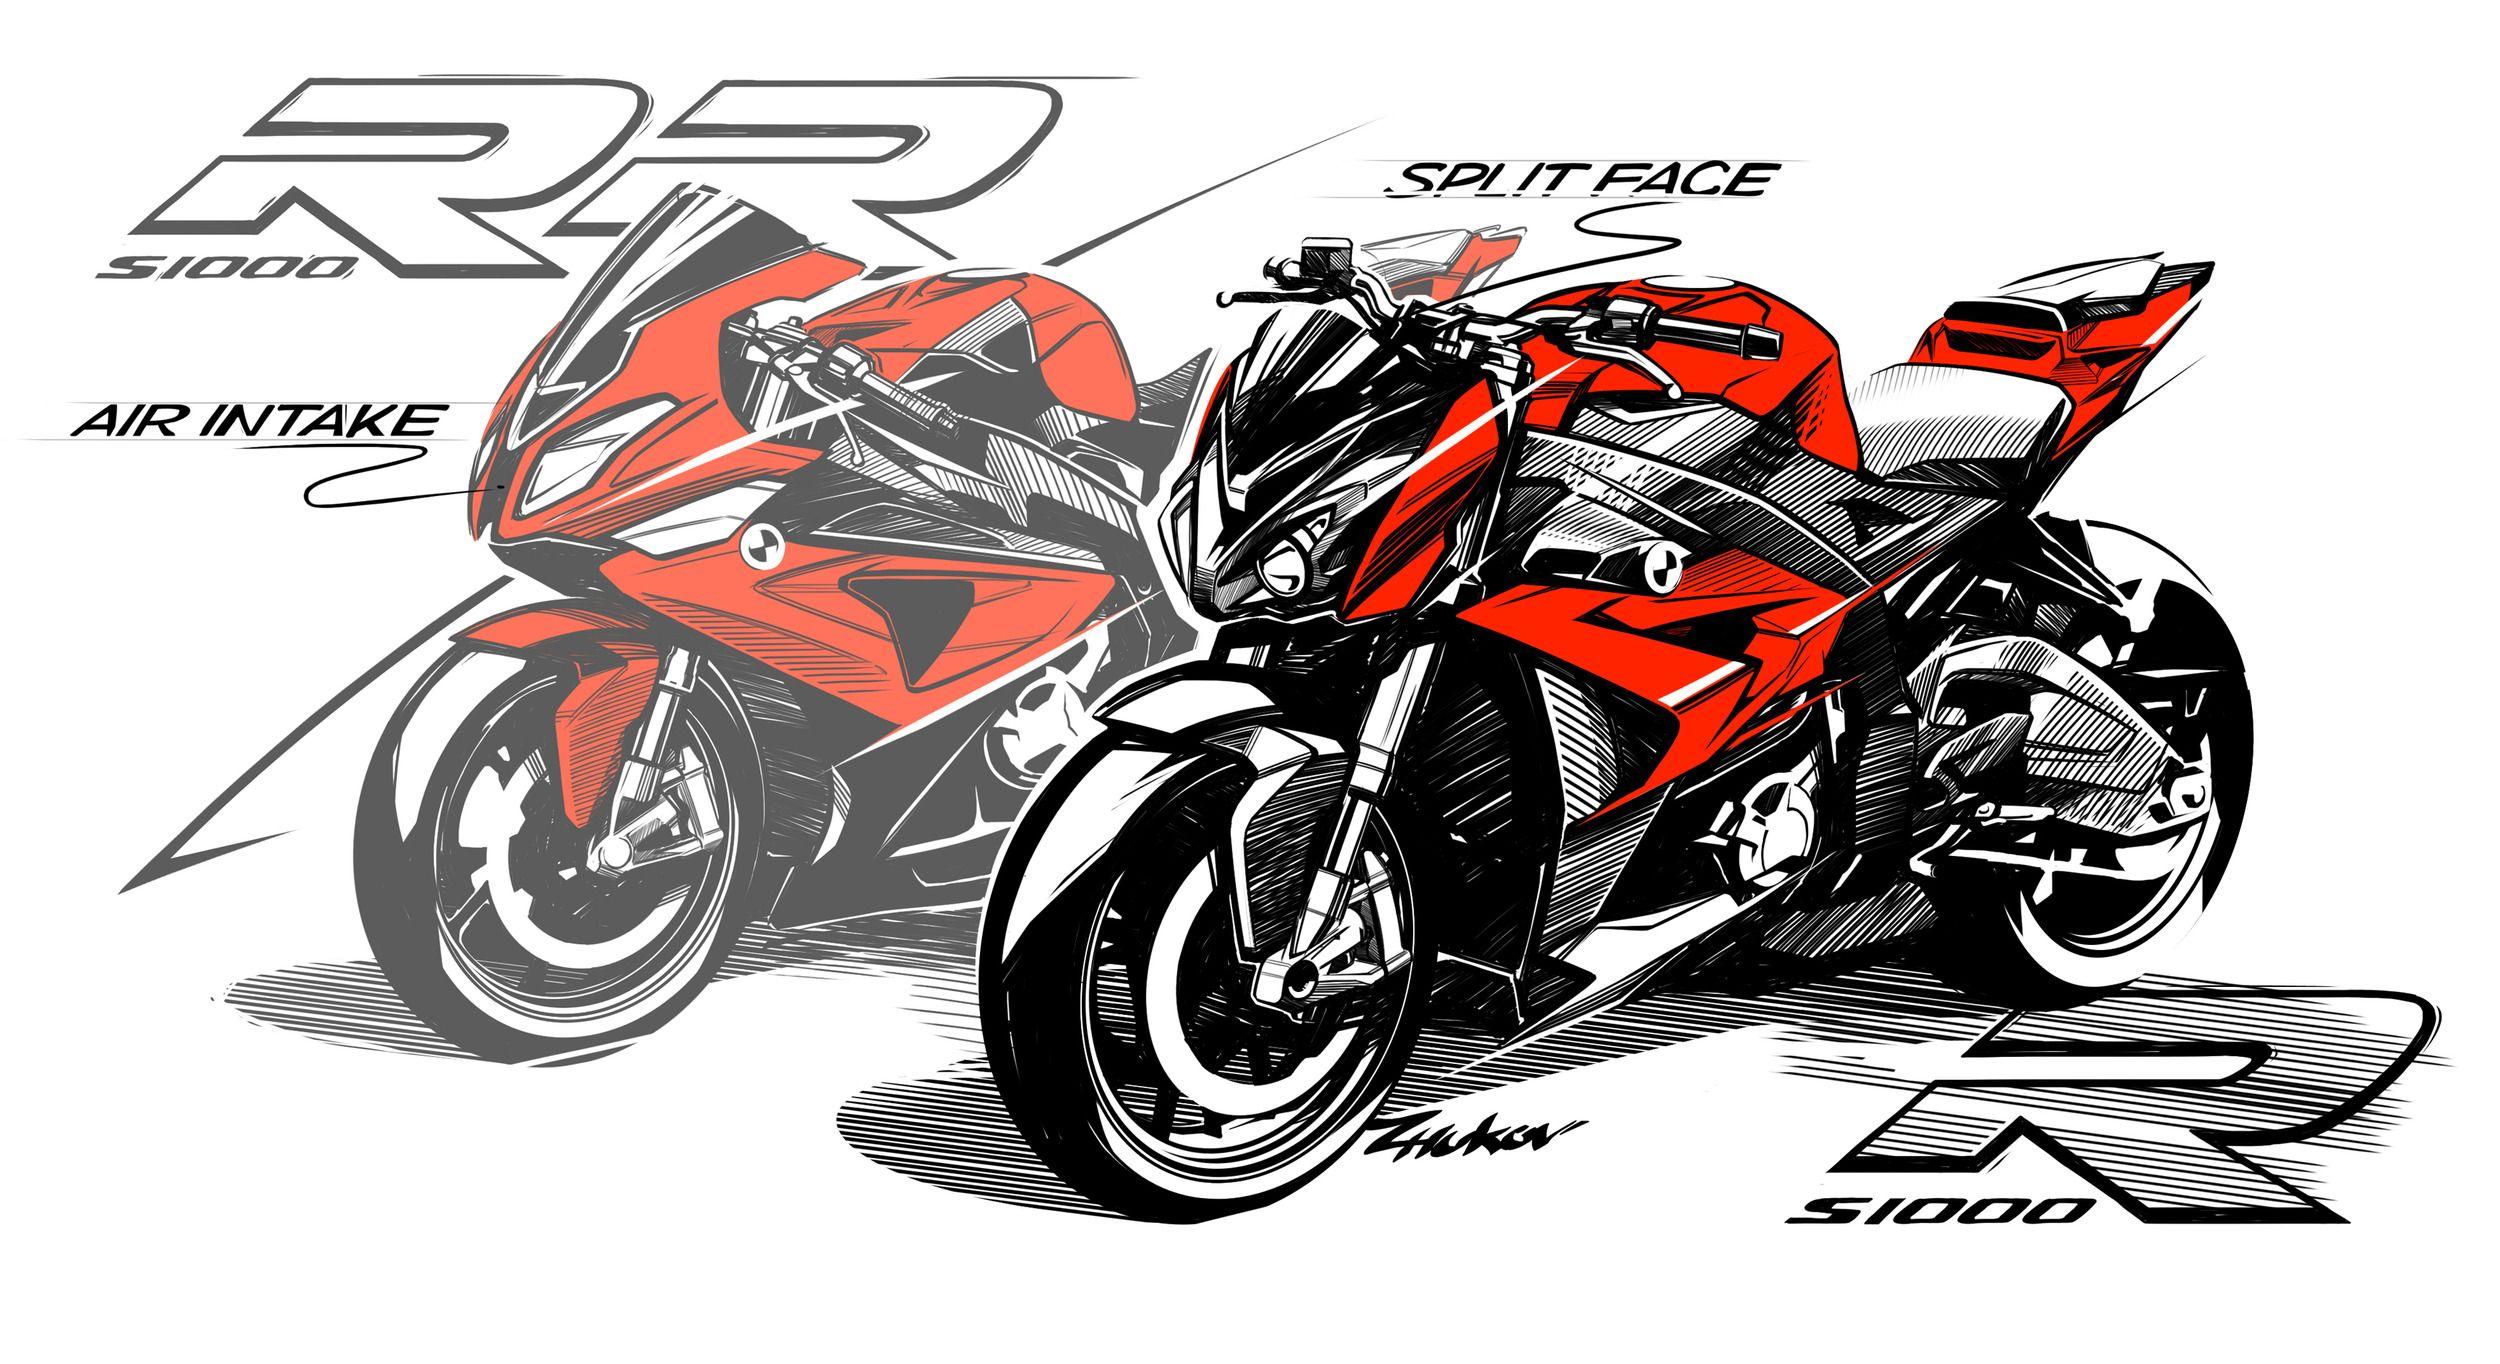 Bmw S1000r V S1000rr Bmw Motorcycle Bike Bmw Motorcycle Design